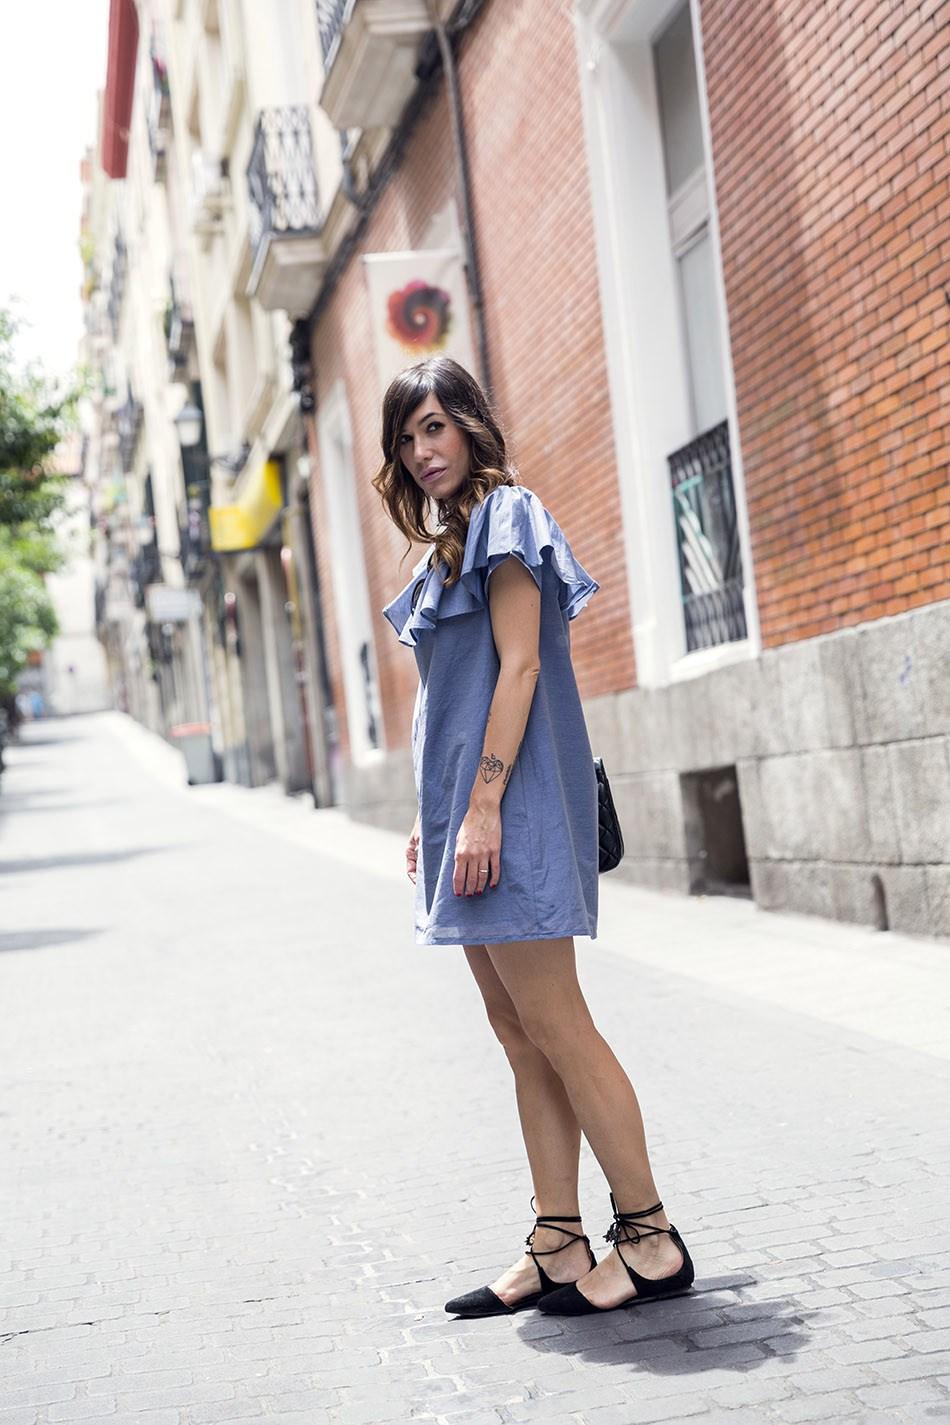 street style june 2016 outfits review bárbara crespo 03